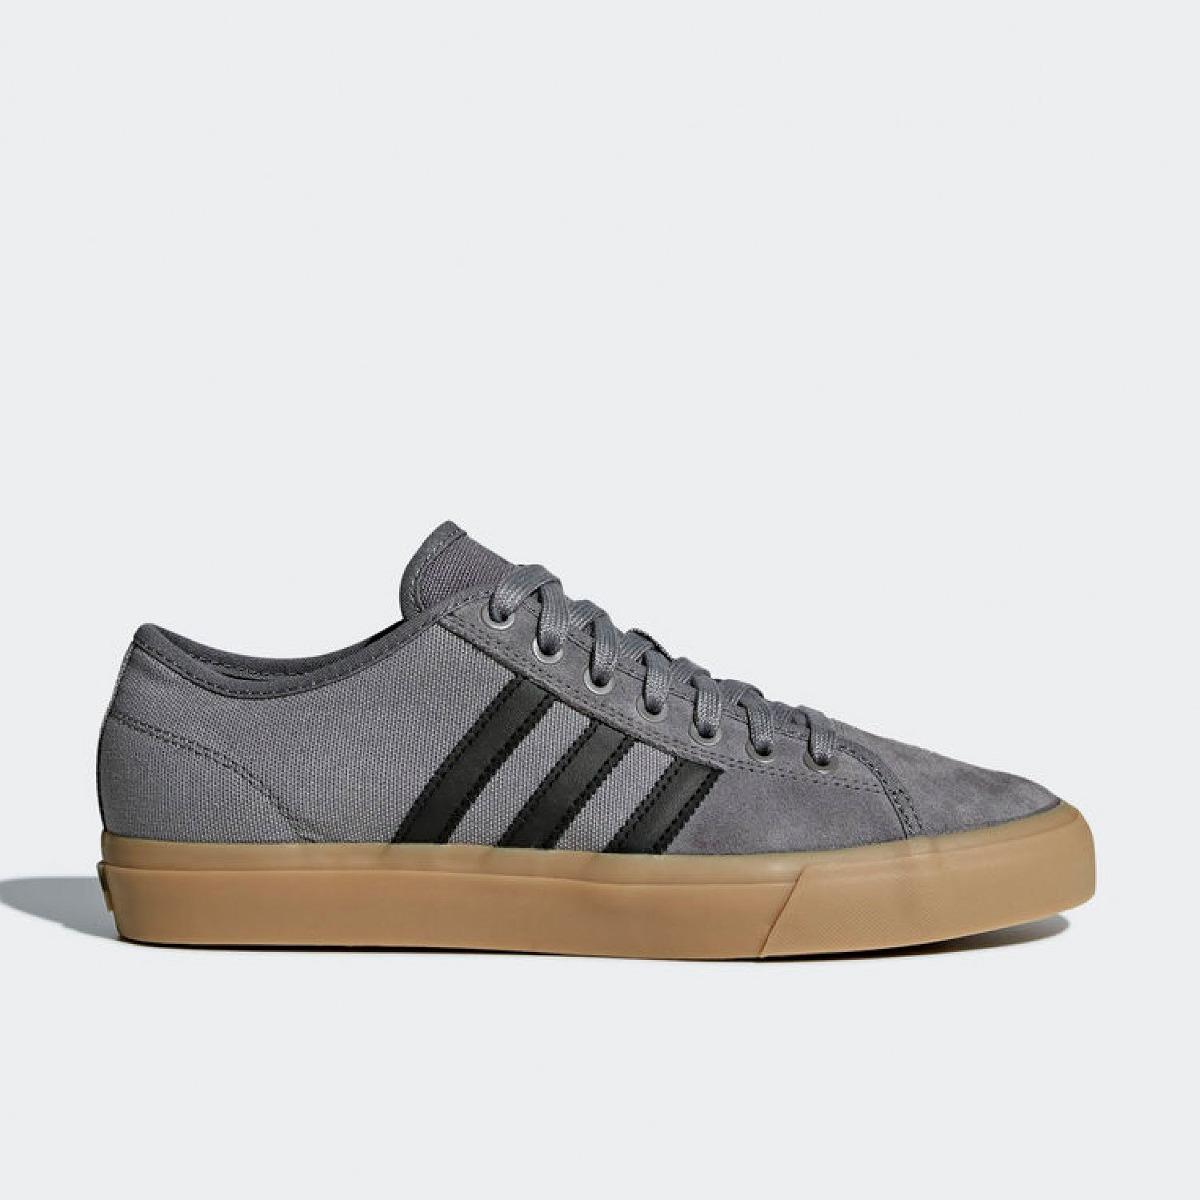 5Envio RxN° Adidas 8 Zapatillas Matchcourt Usa Gratis FlK1JcT